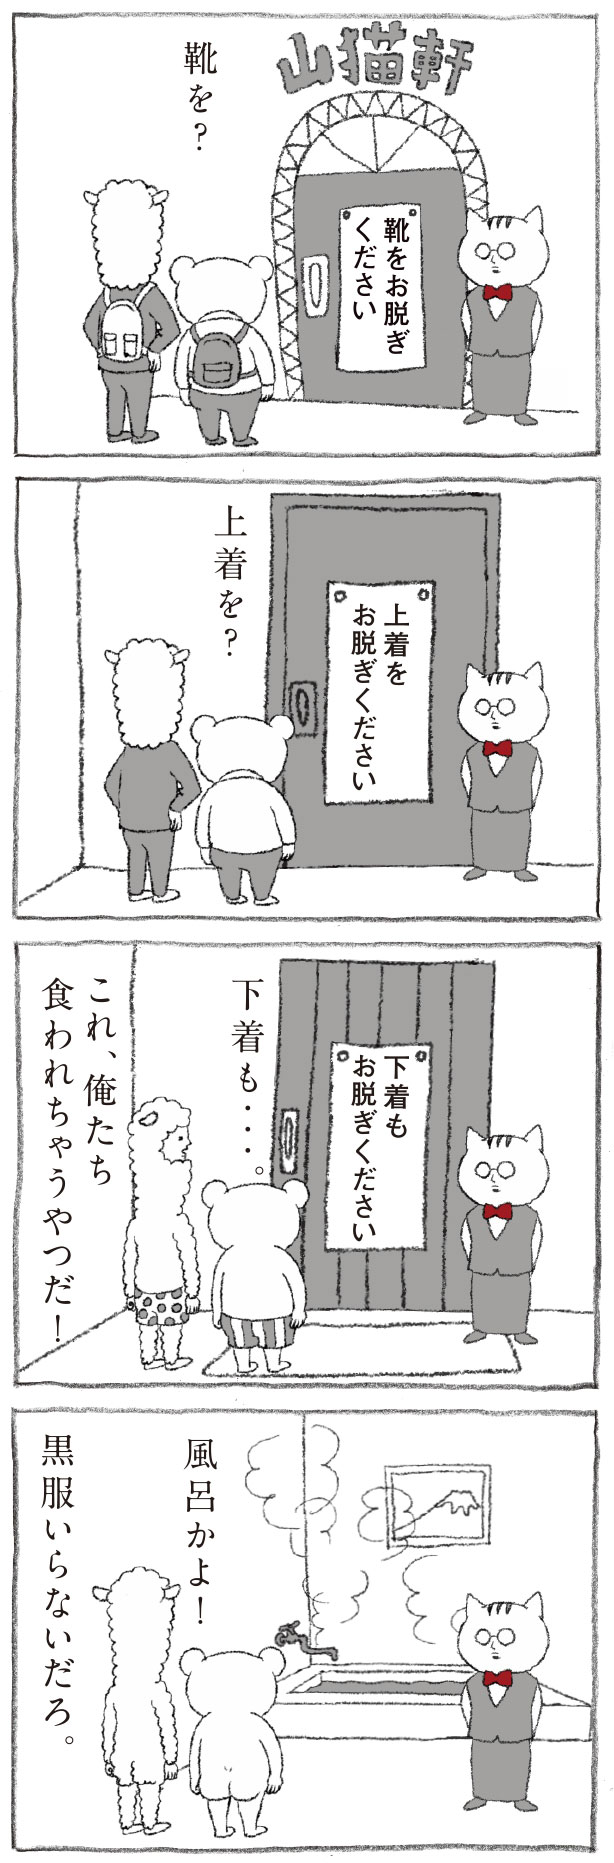 Hanako 1178号:おかわり自由